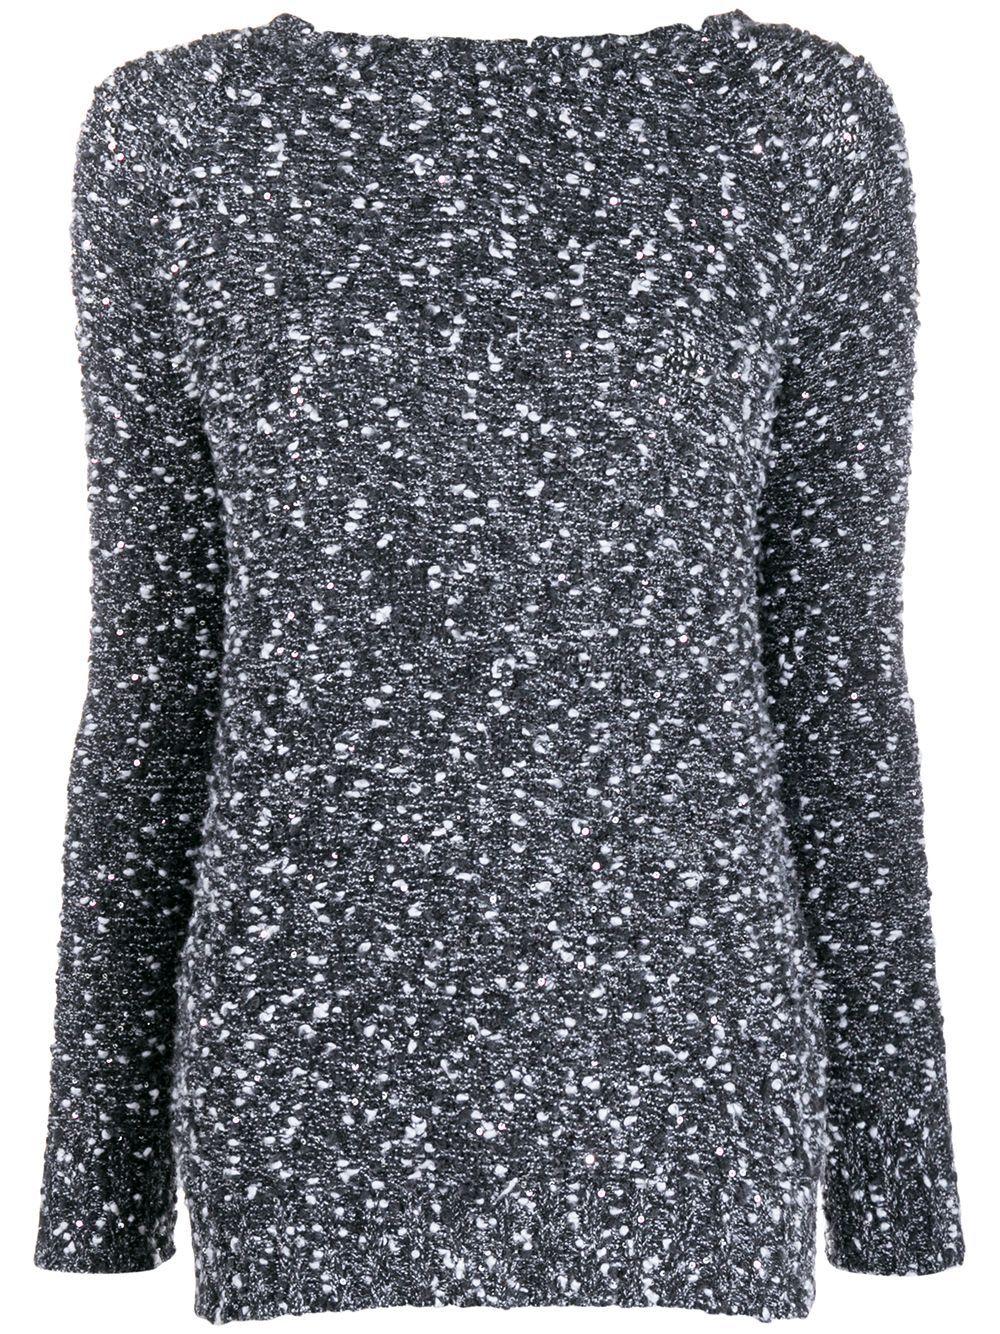 Snobby Sheep round-neck knit jumper - Black